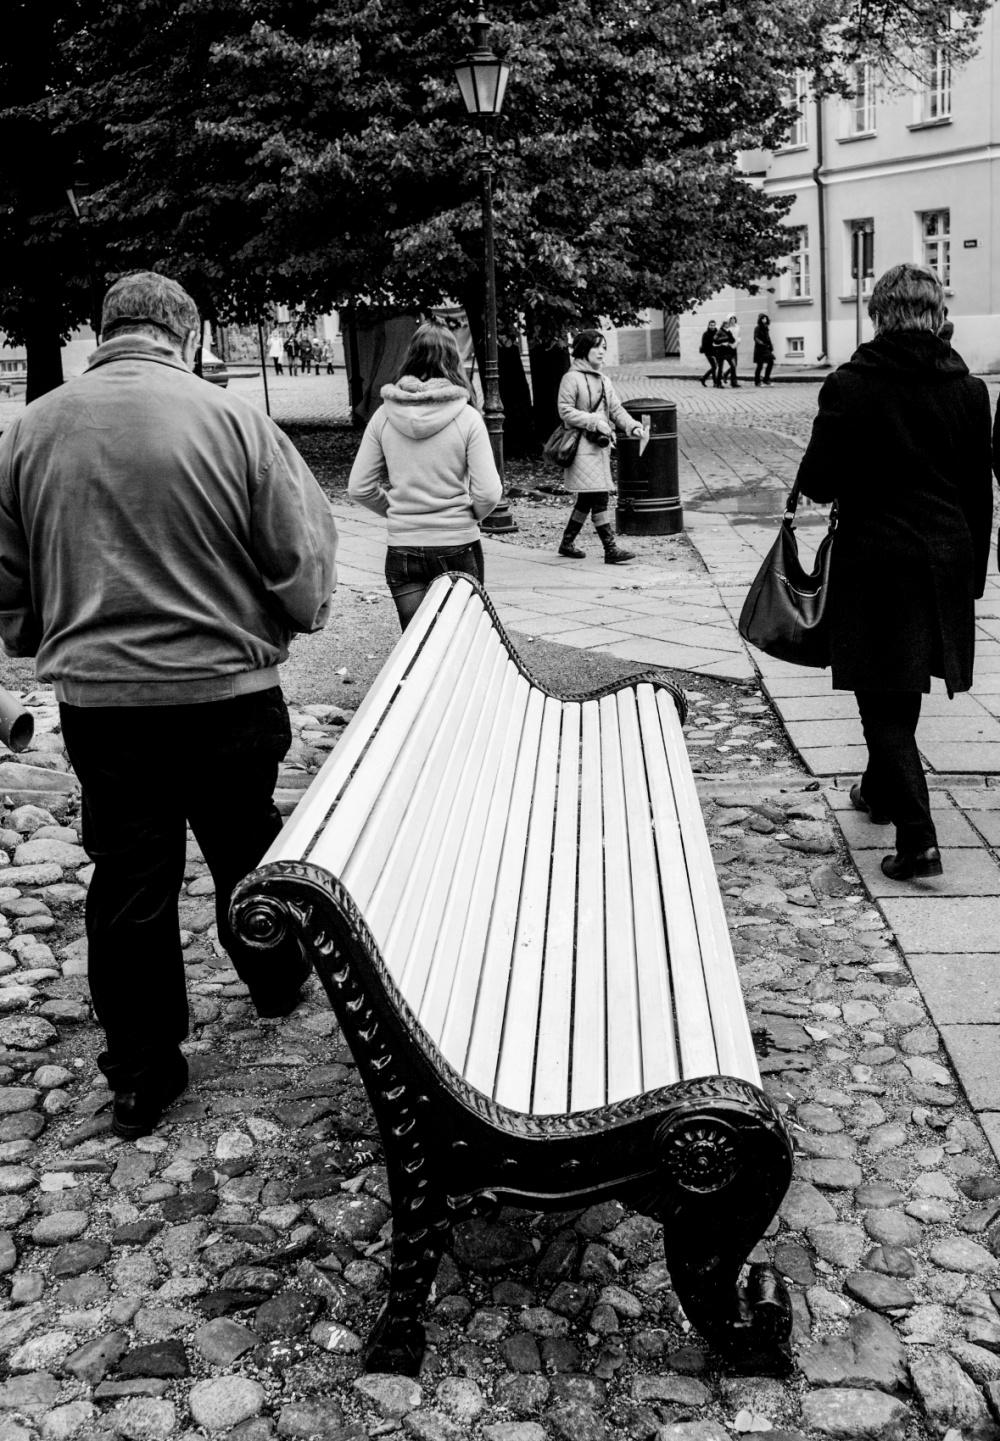 John T. Pedersen Photography - 2012 Daily life in Tallin